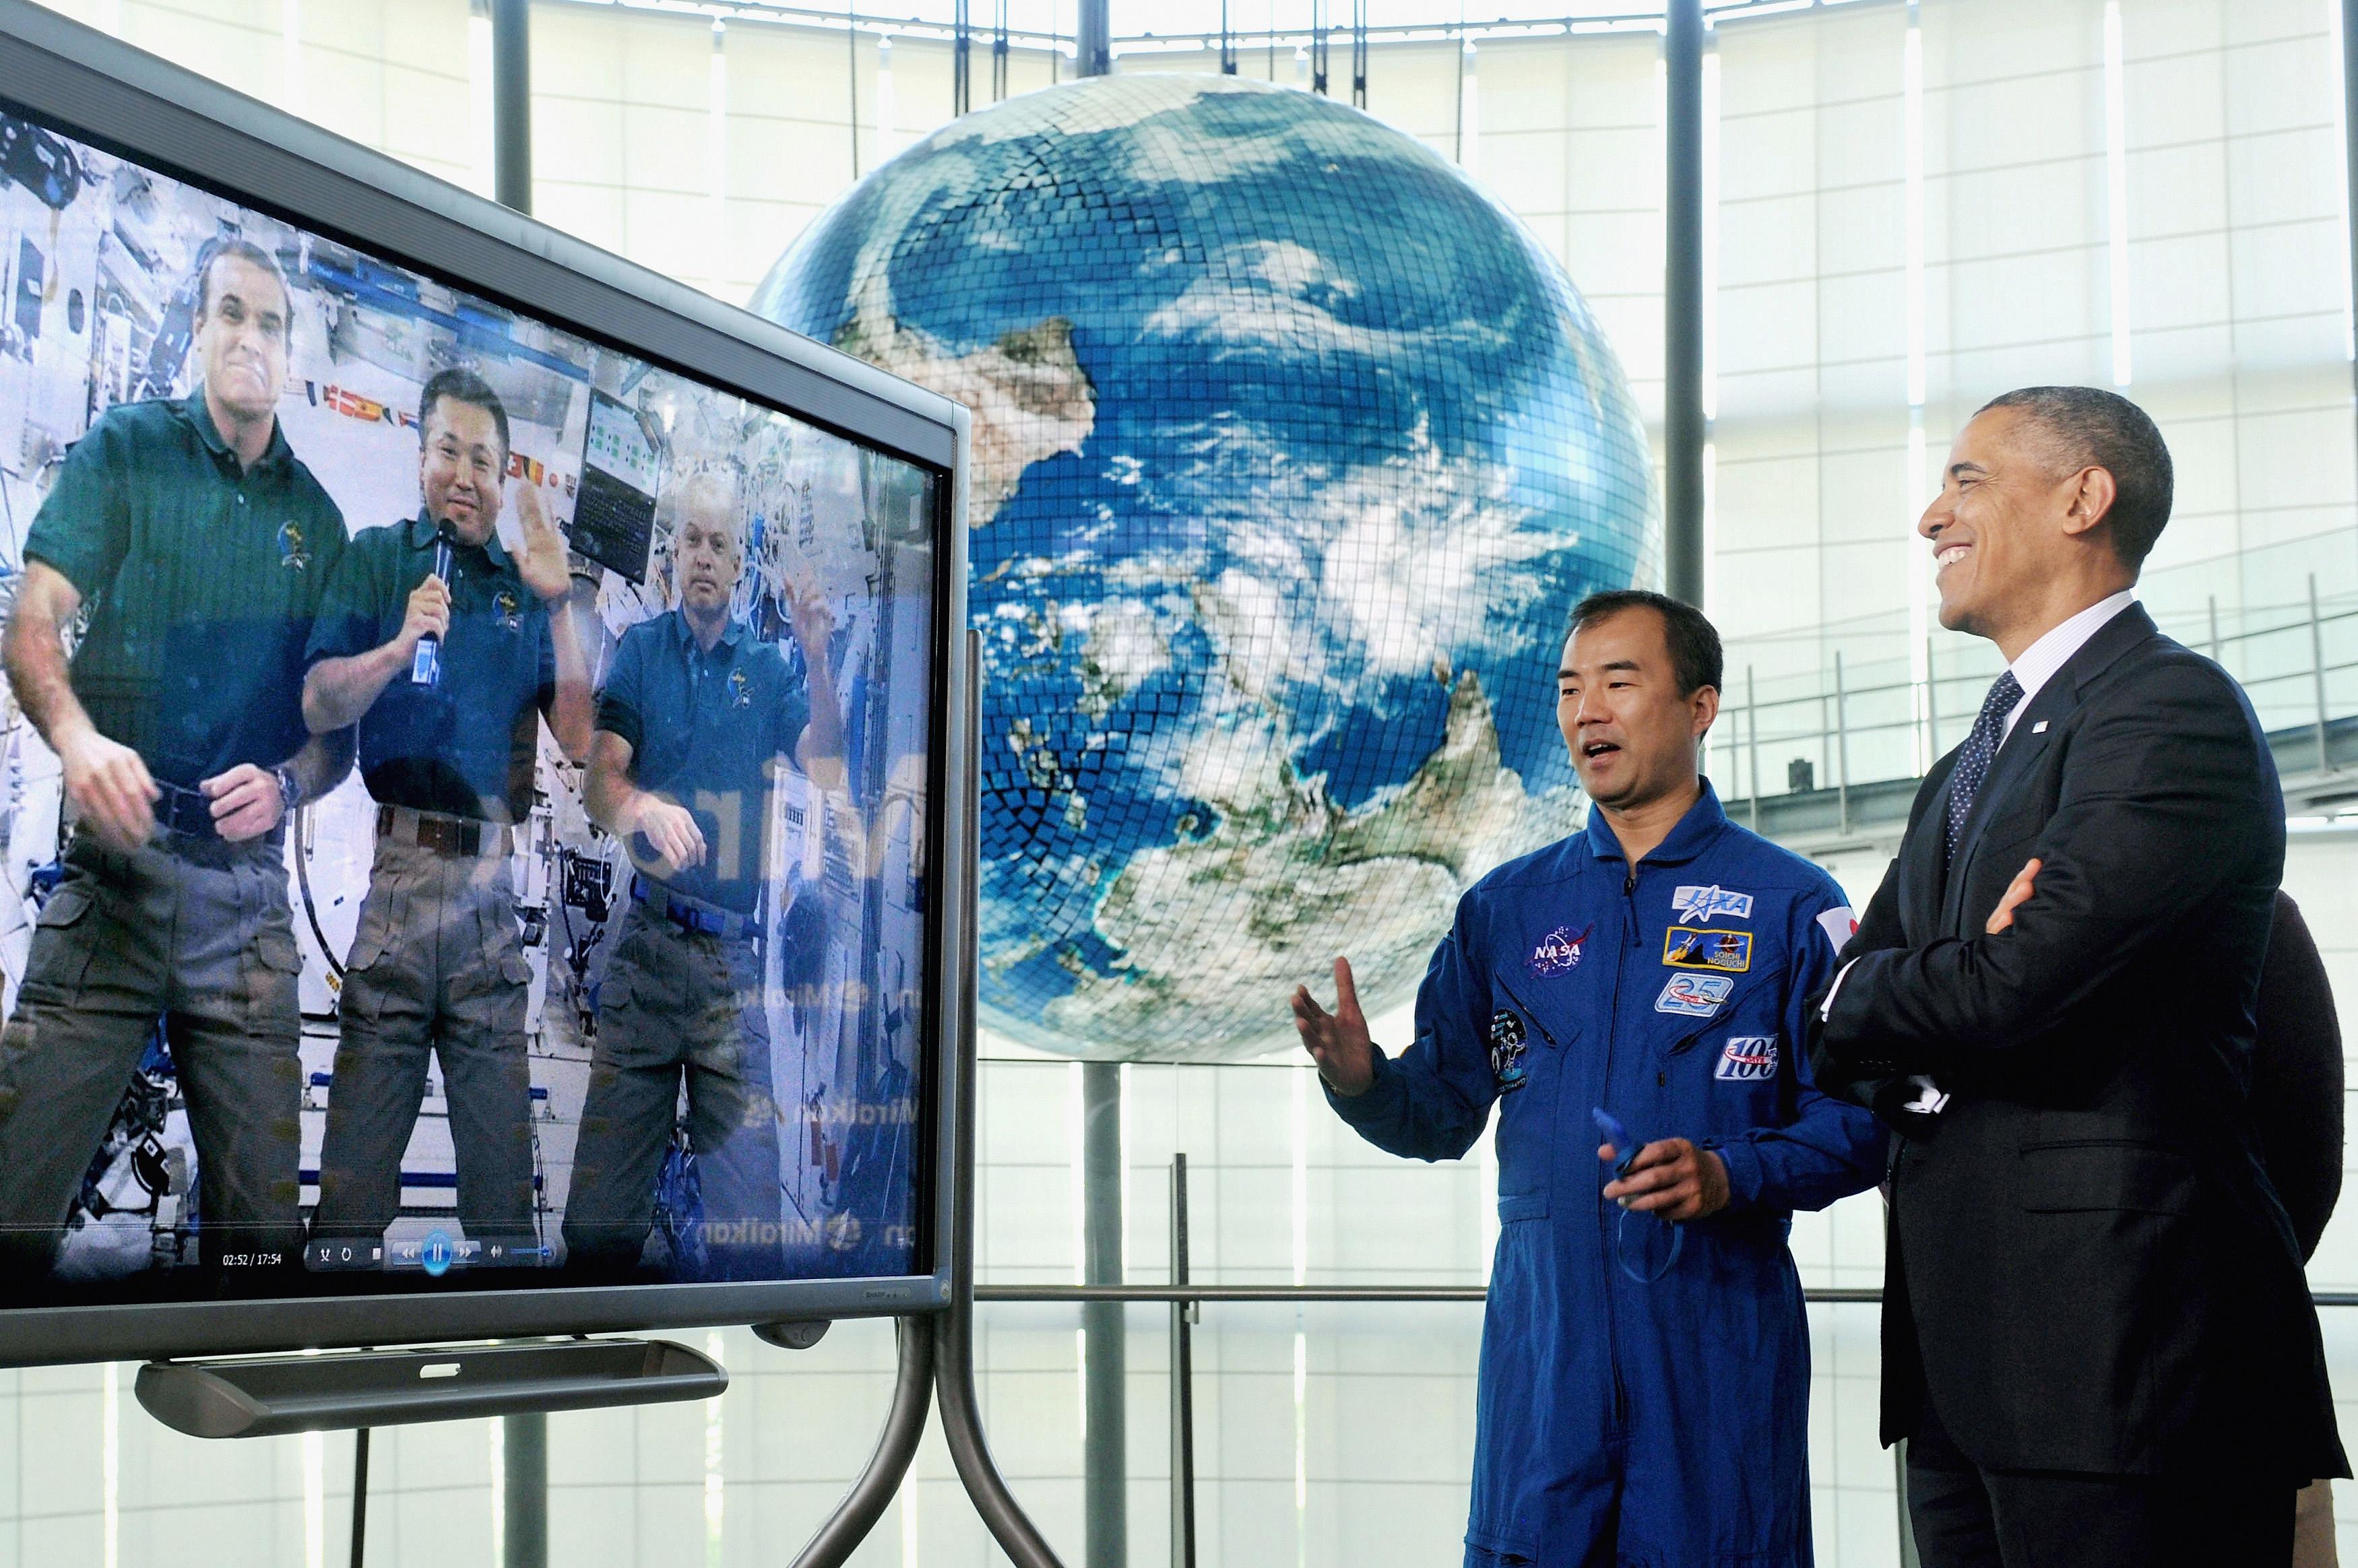 obama new nasa space shuttle - photo #35